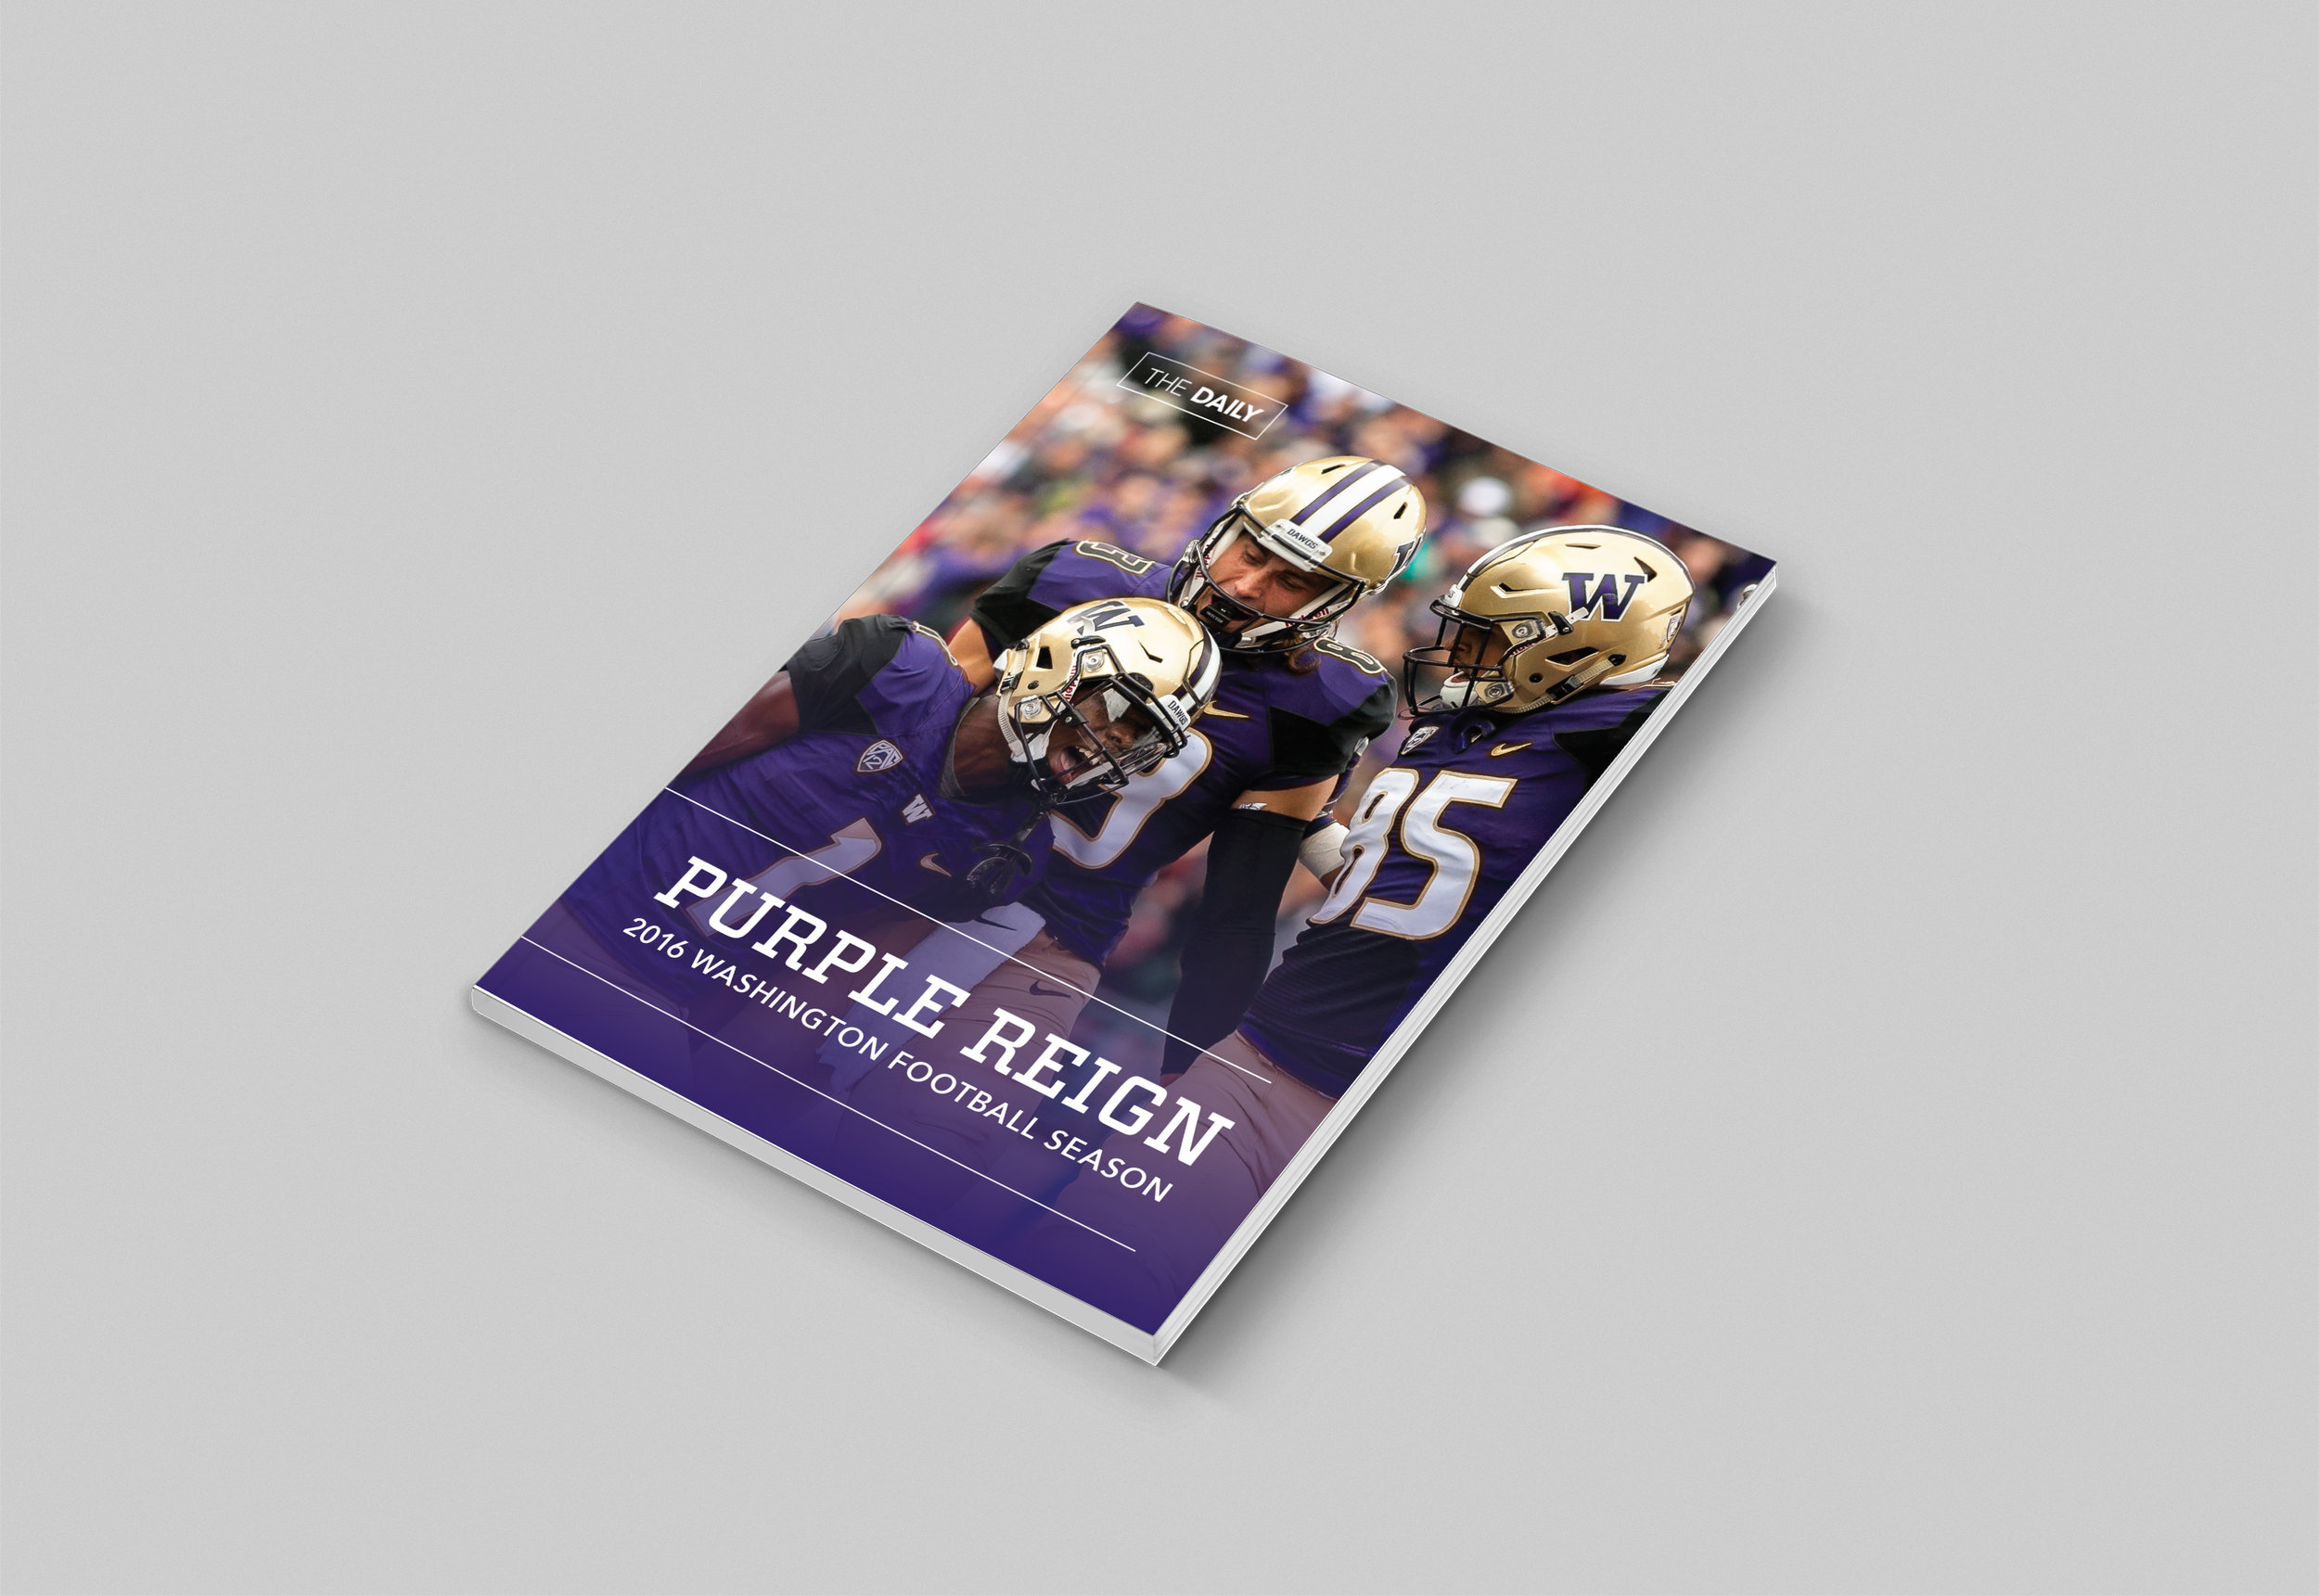 football book cover.jpeg